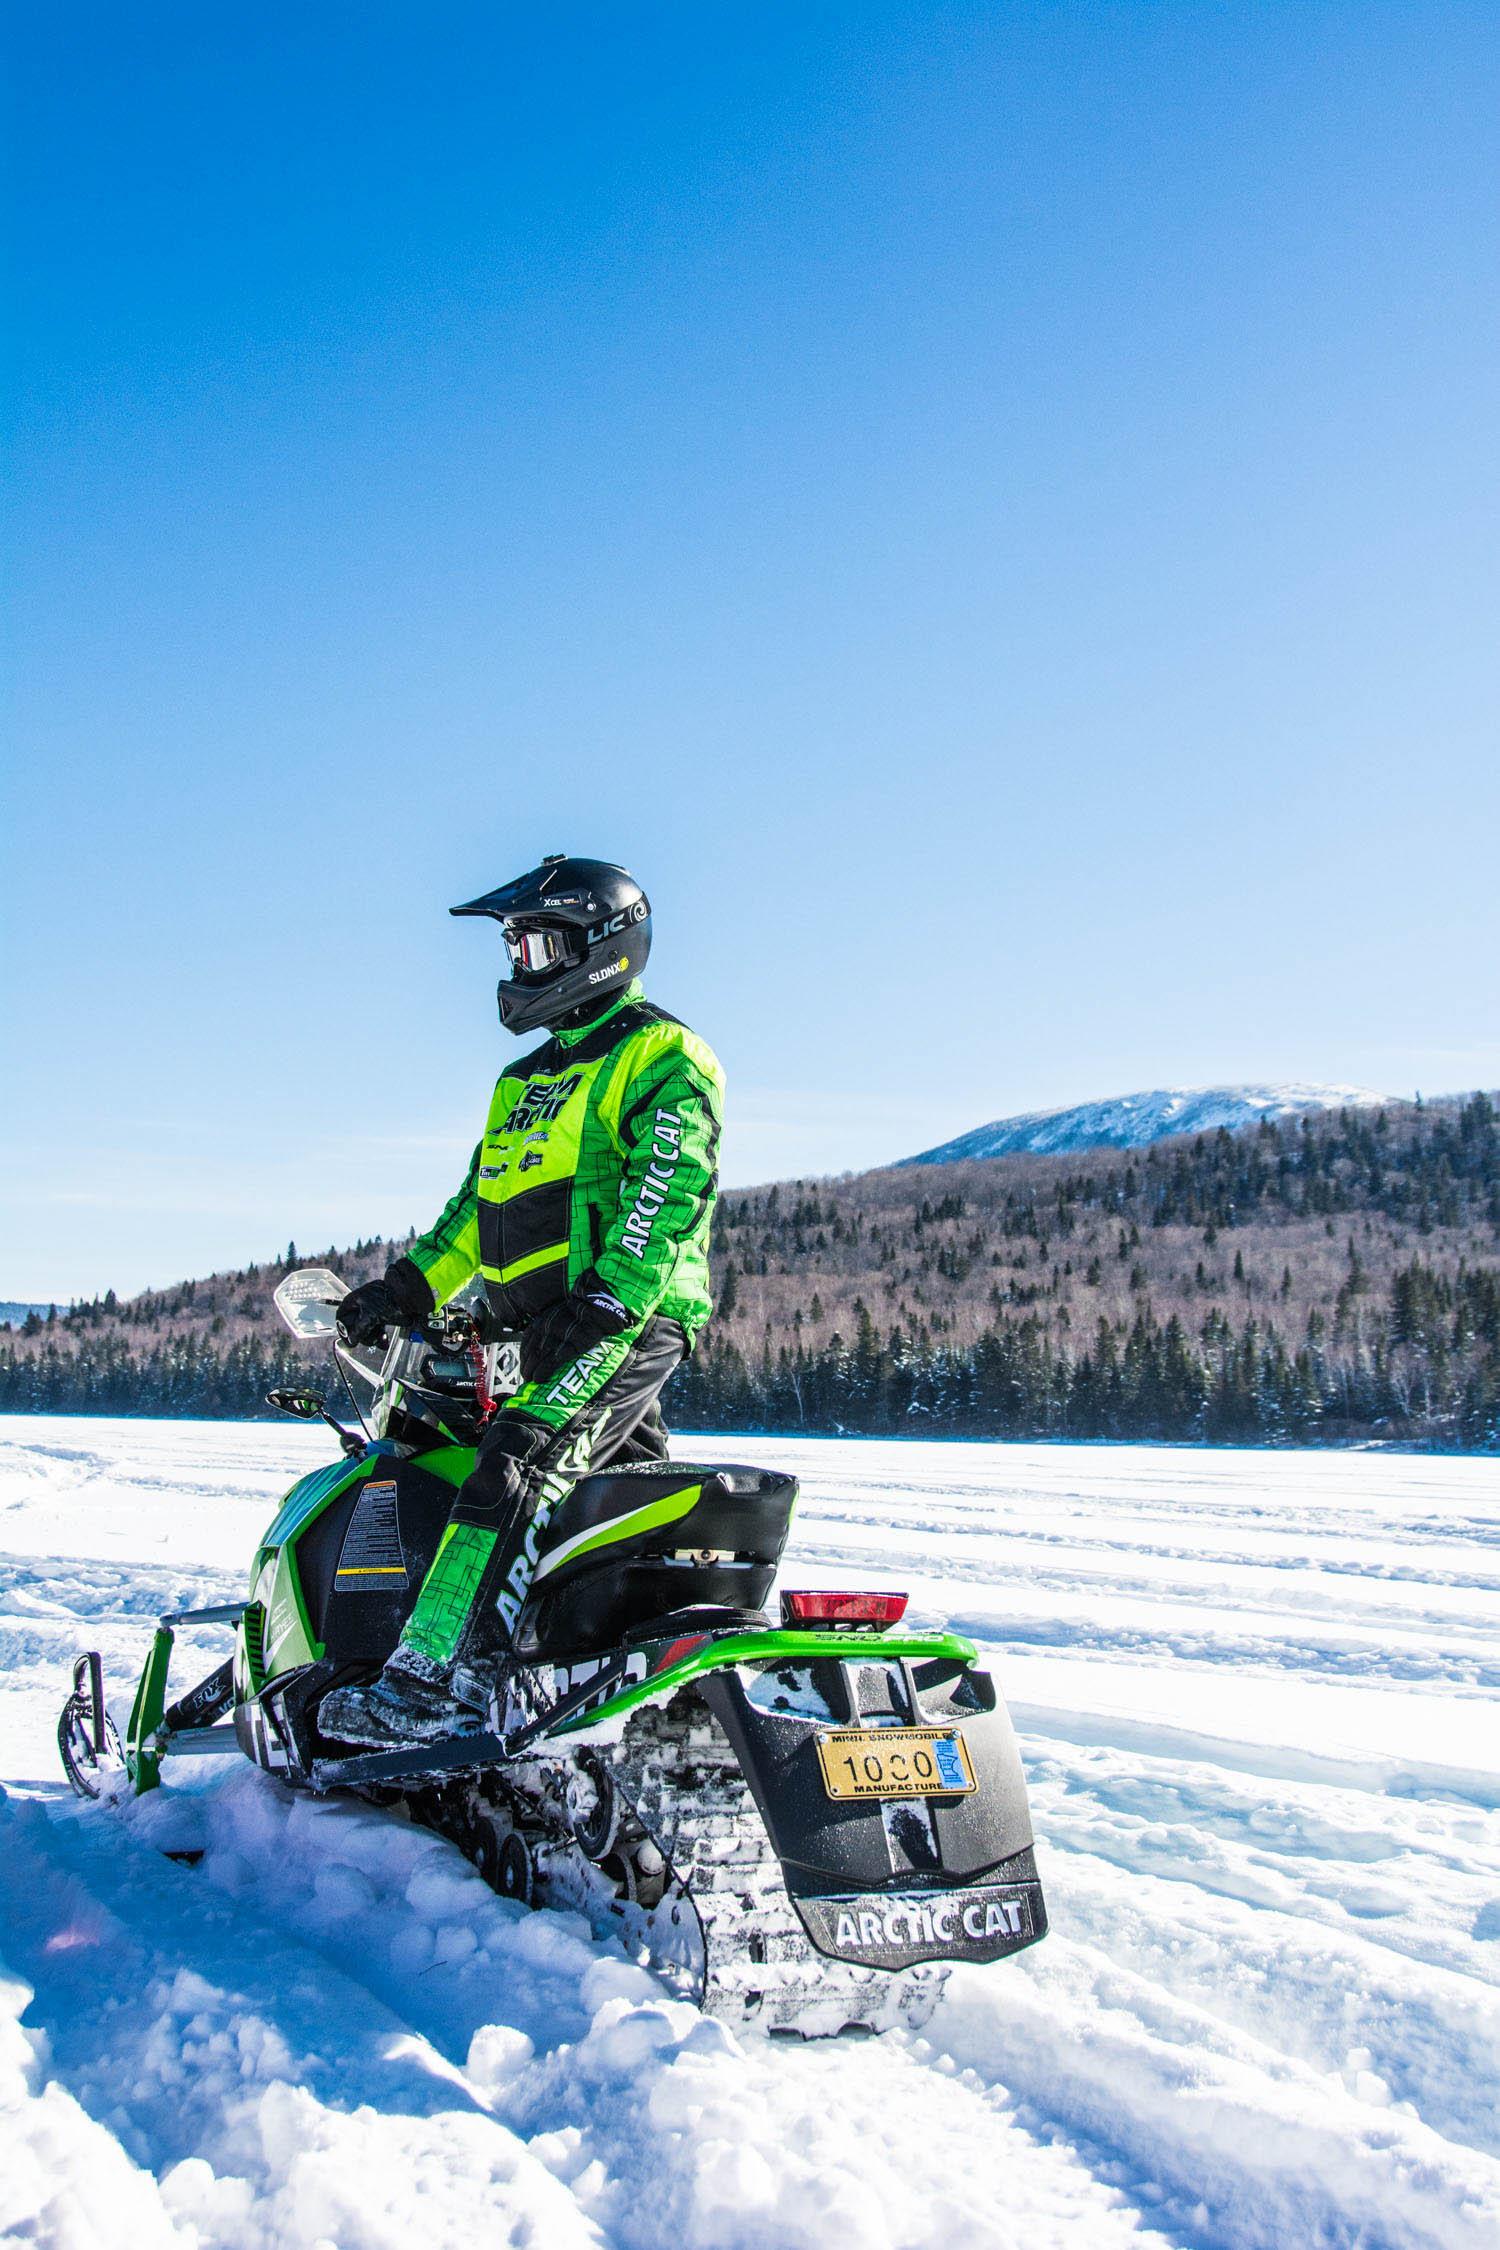 feb10-11 2015-Tourism New Brunswick-T4G Kick-winter 2015-New Brunswick Great Northern Odyssey-snowmobile trip-Mount Carleton-NB-photo by Aaron McKenzie Fraser-www.amfraser.com-_AMF4586.jpg